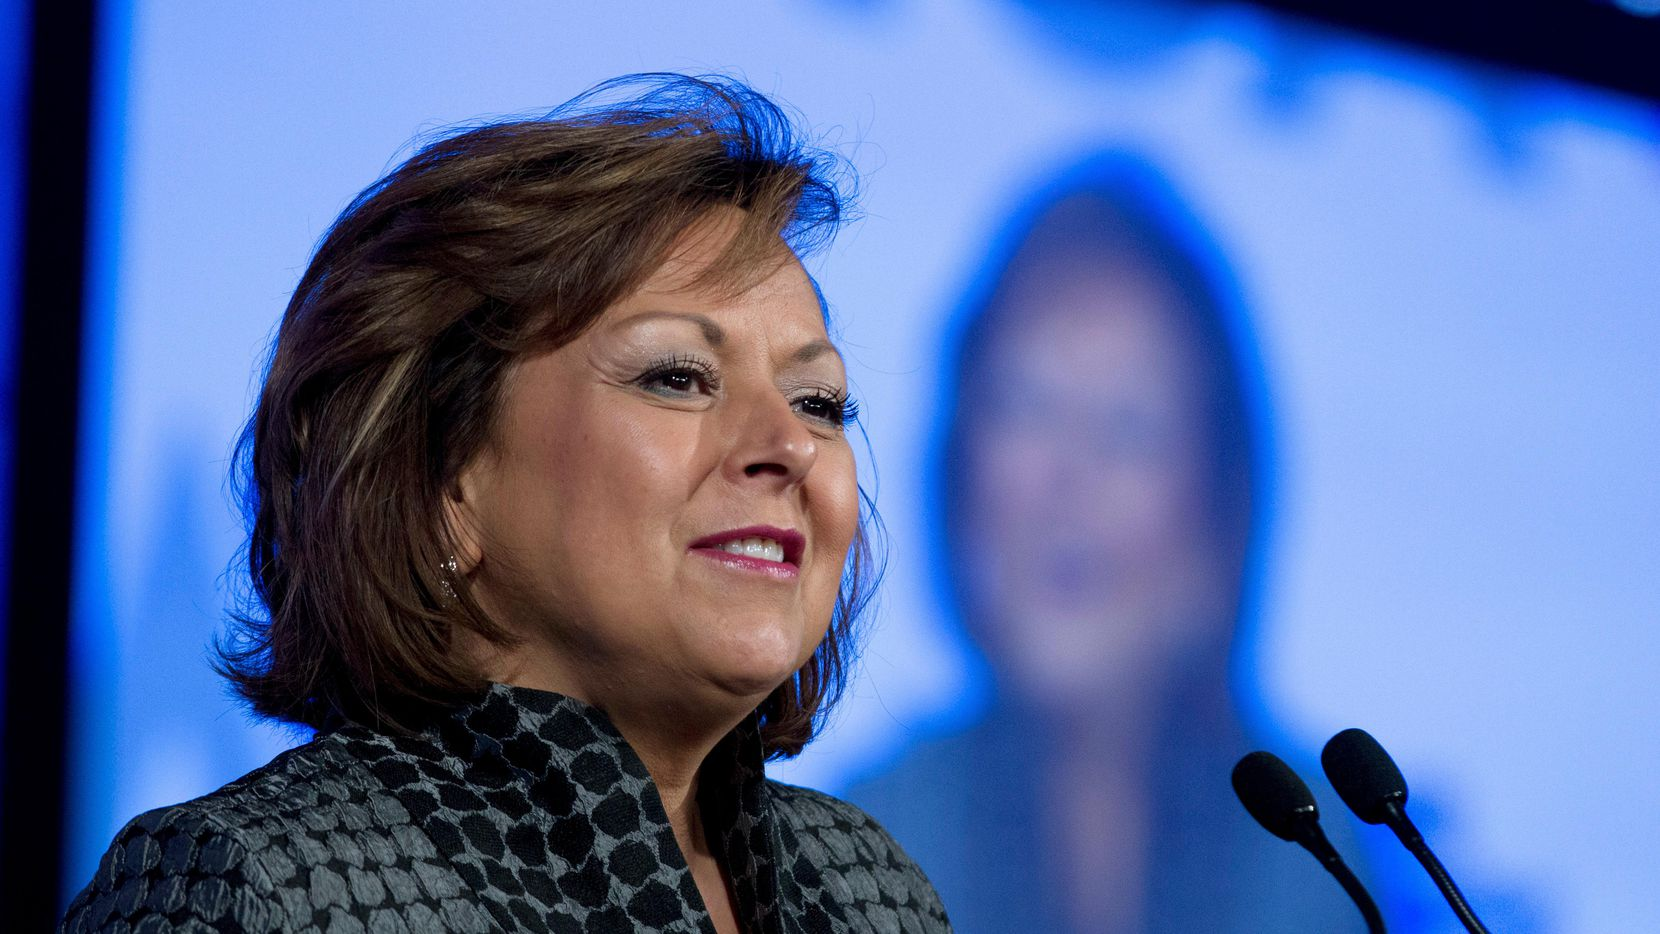 La gobernadora de New Mexico Susana Martínez. (AP/Jose Luis Magana)